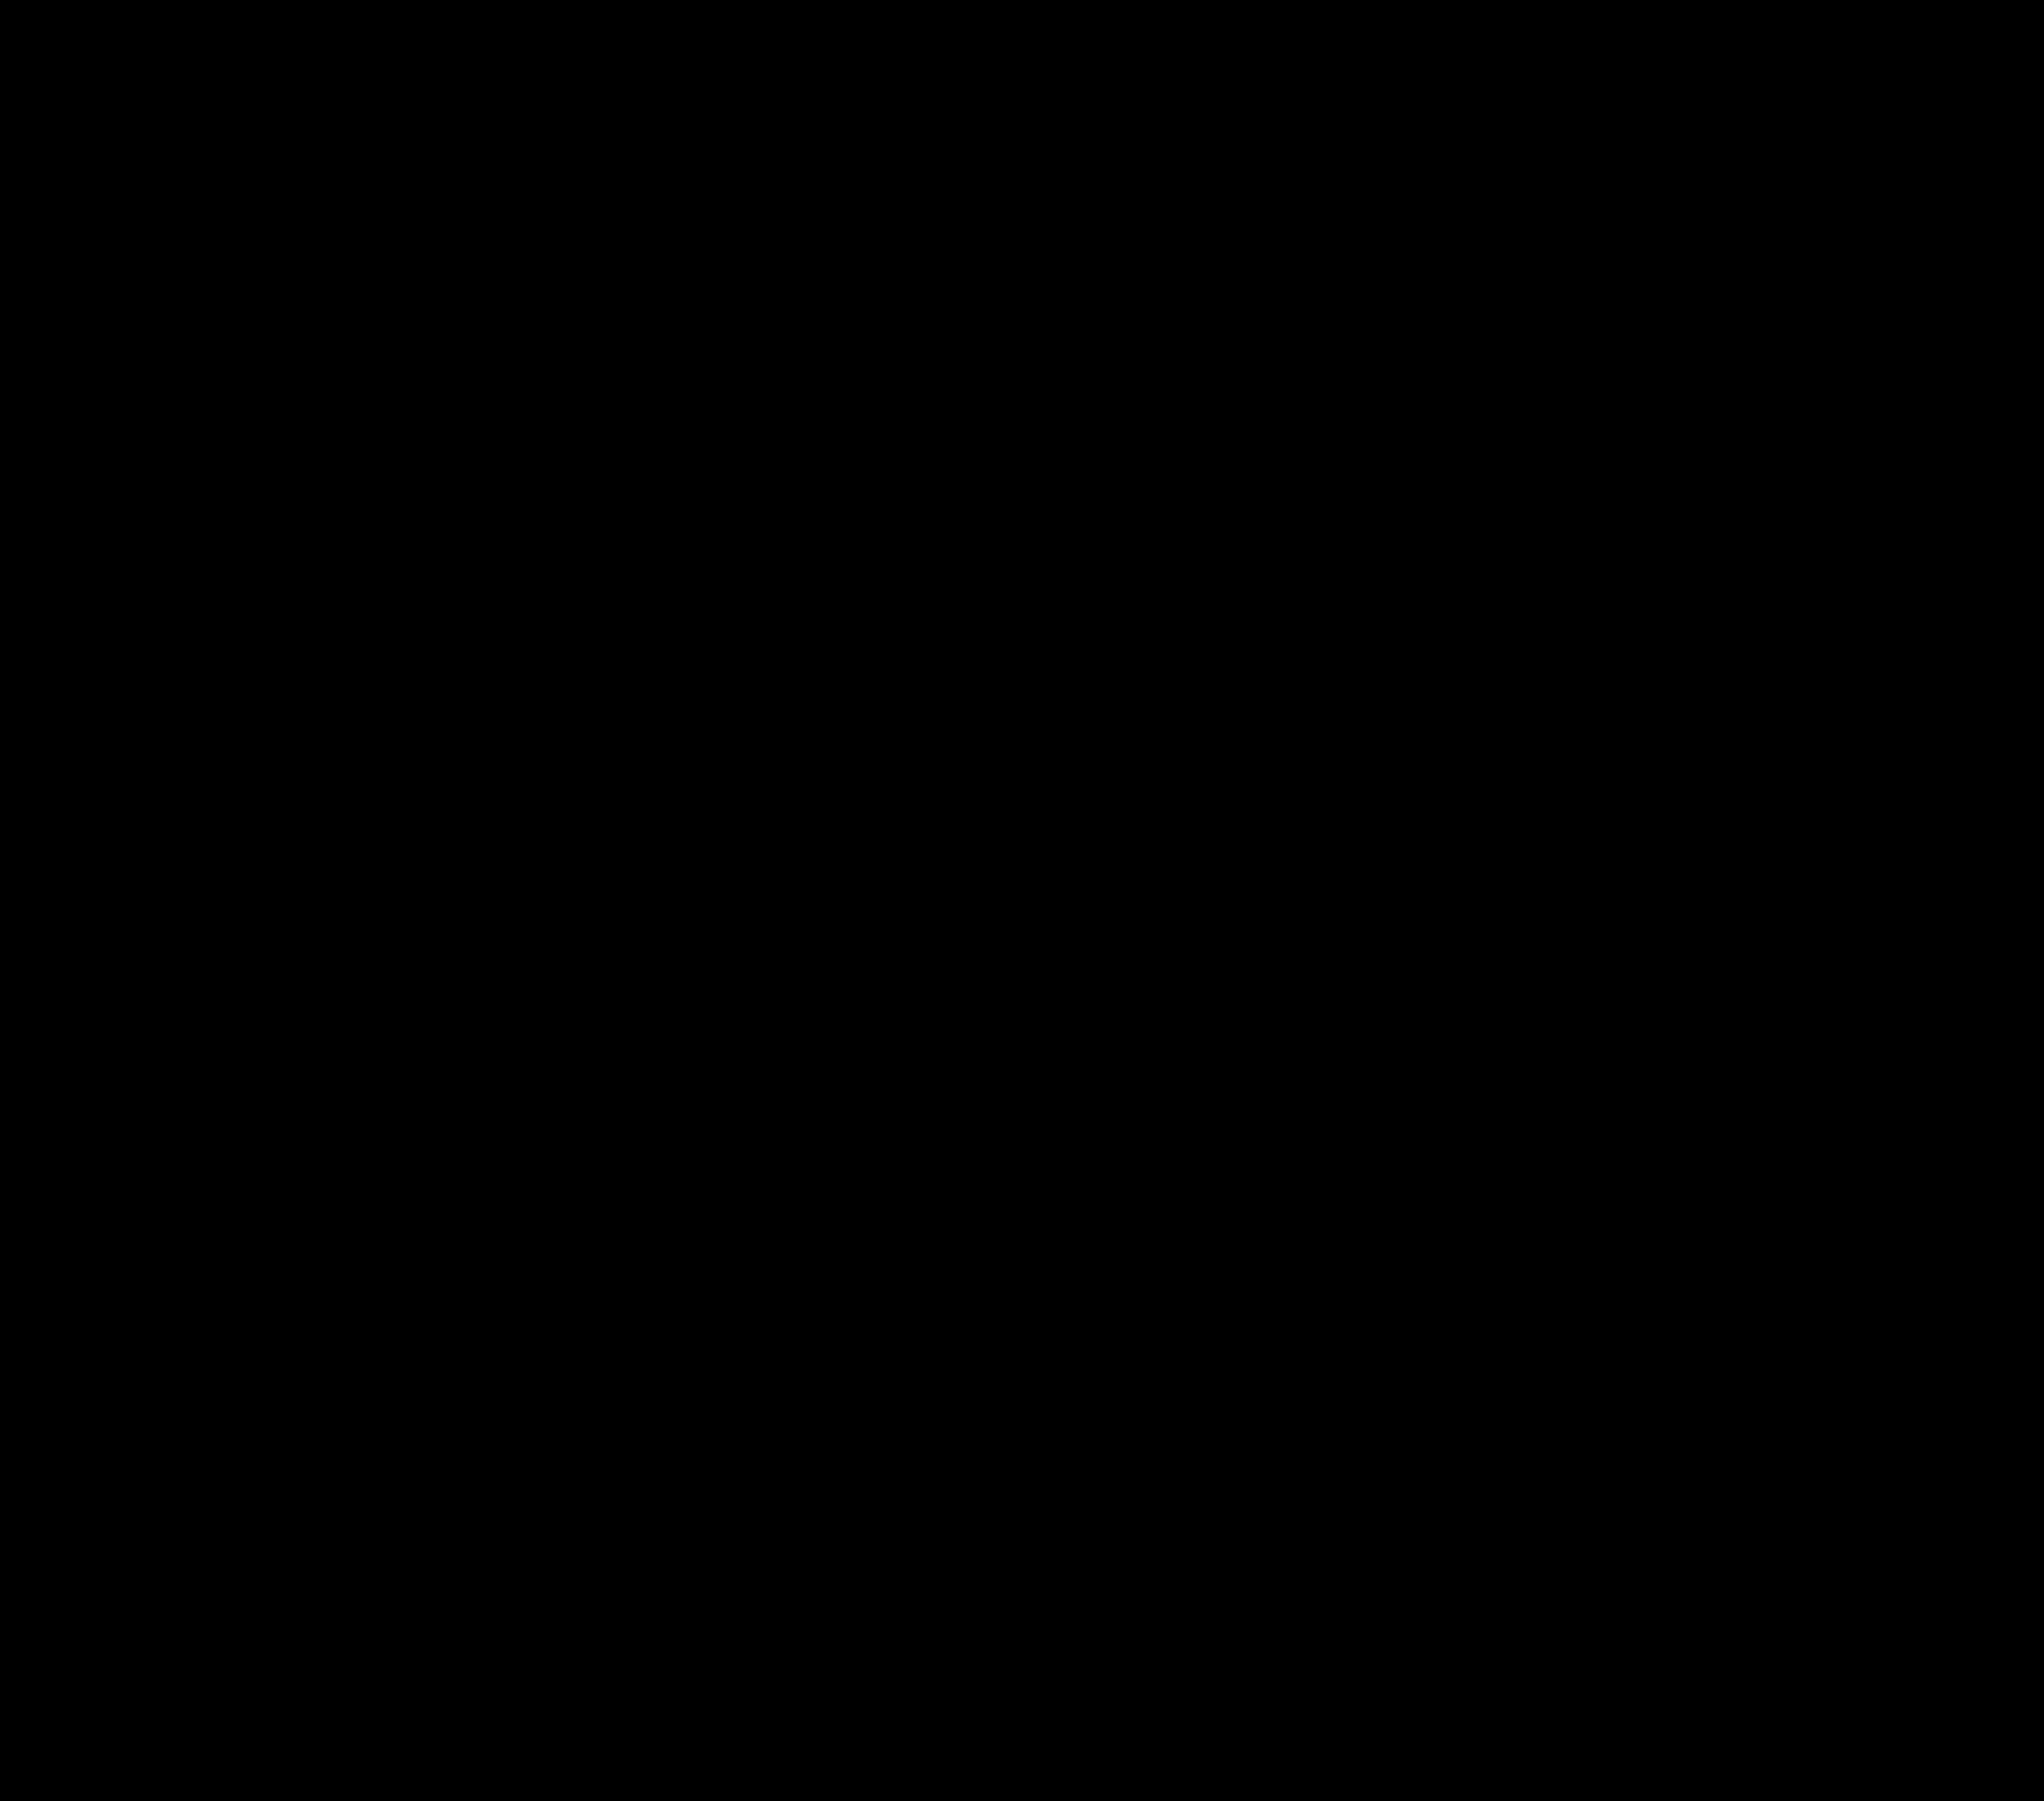 Transparent svg vector freebie. Windows logo png